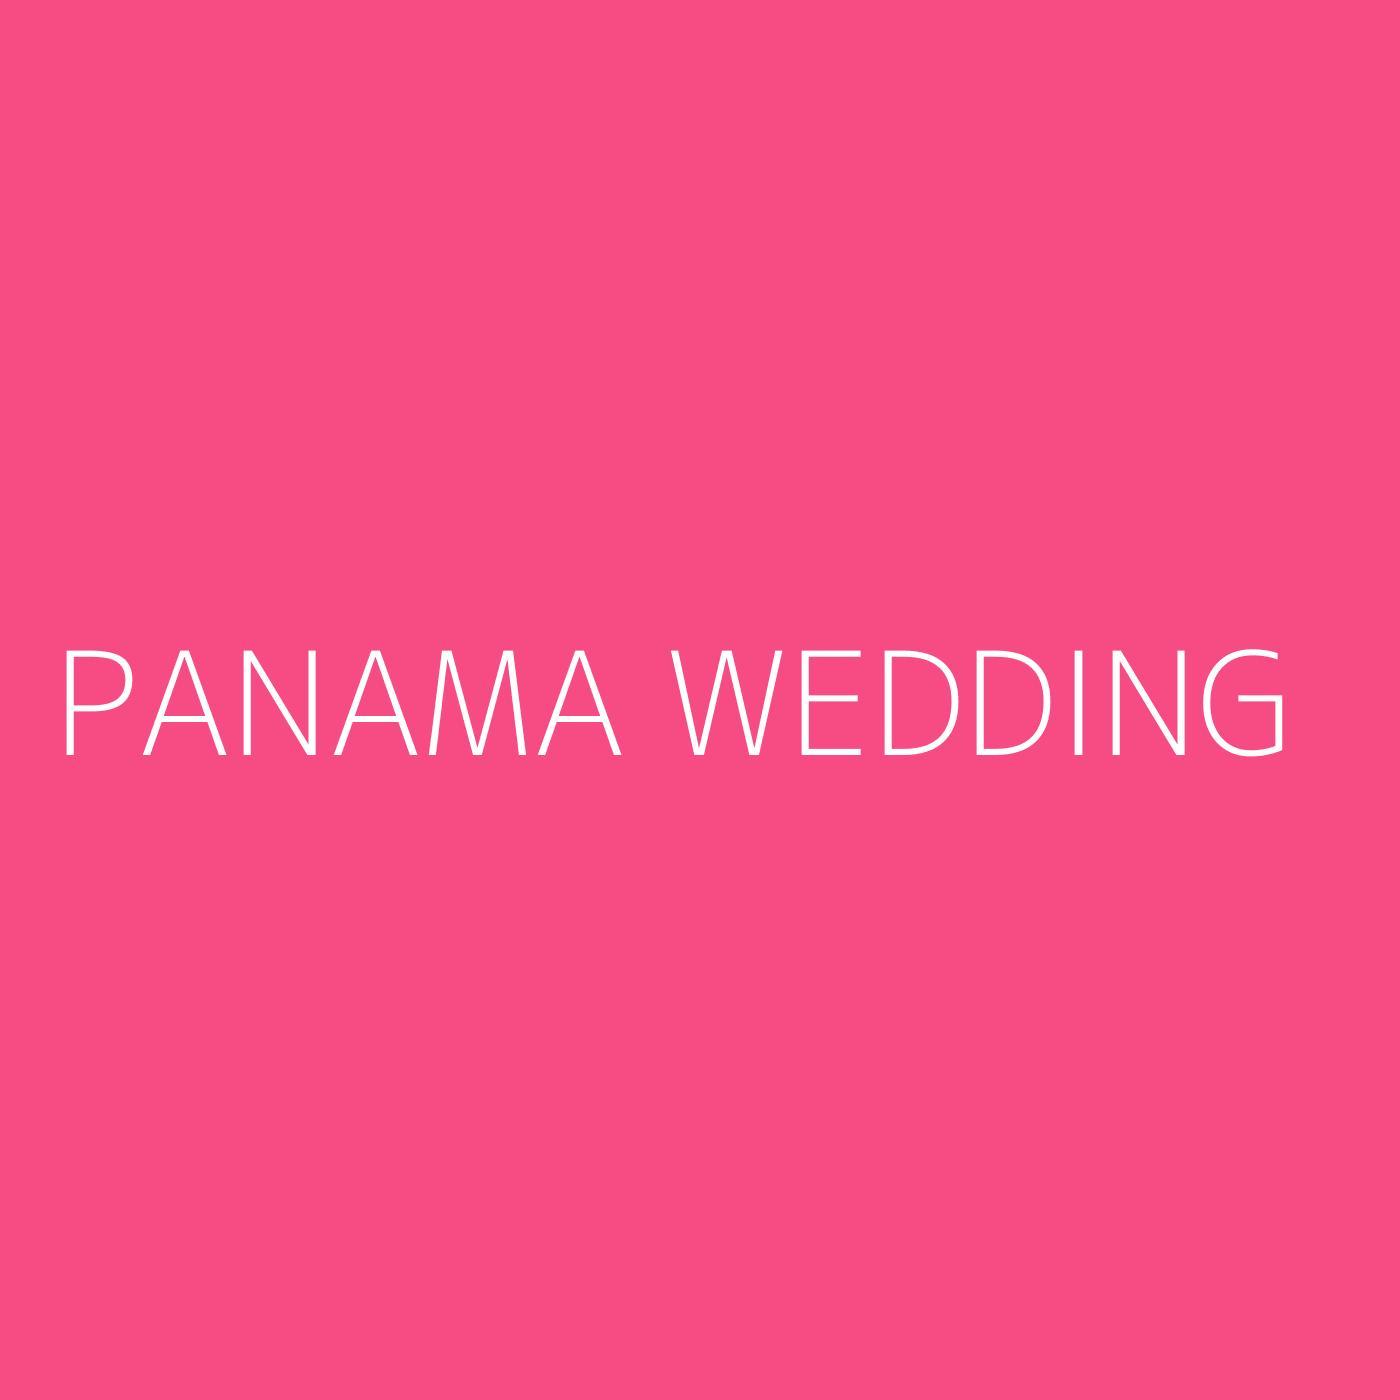 Panama Wedding Playlist Artwork